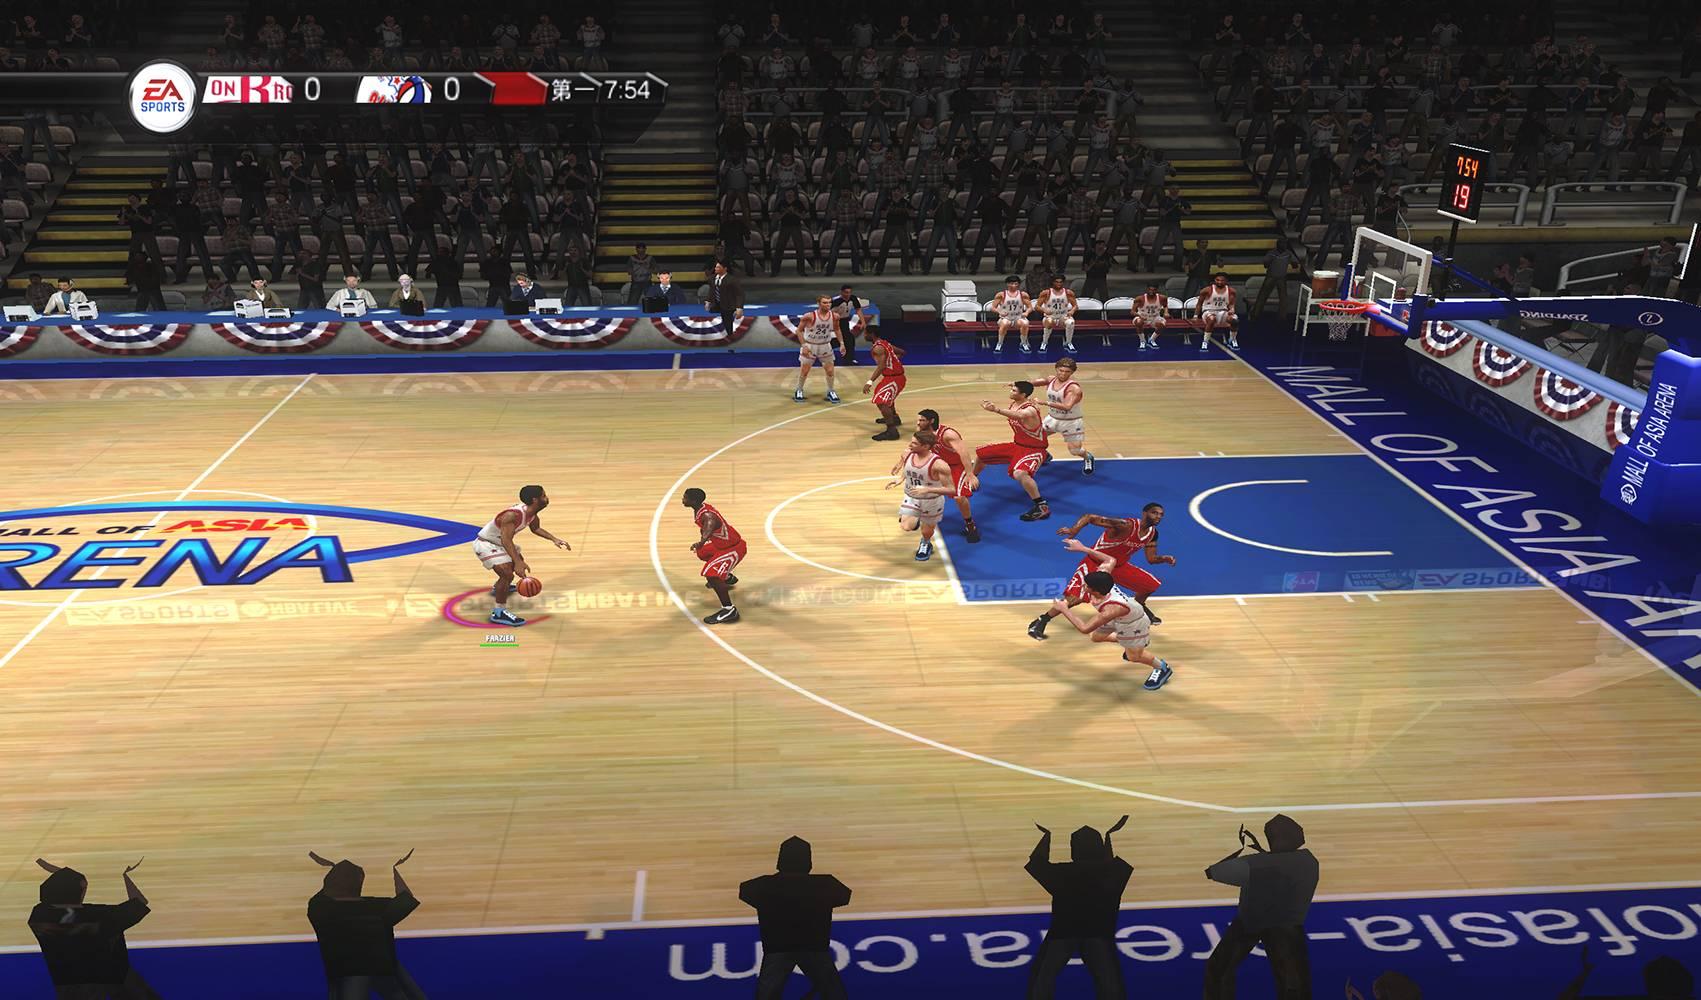 NBA LIVE 08【2K】-2021-03-31-01-22-38-878副本.jpg